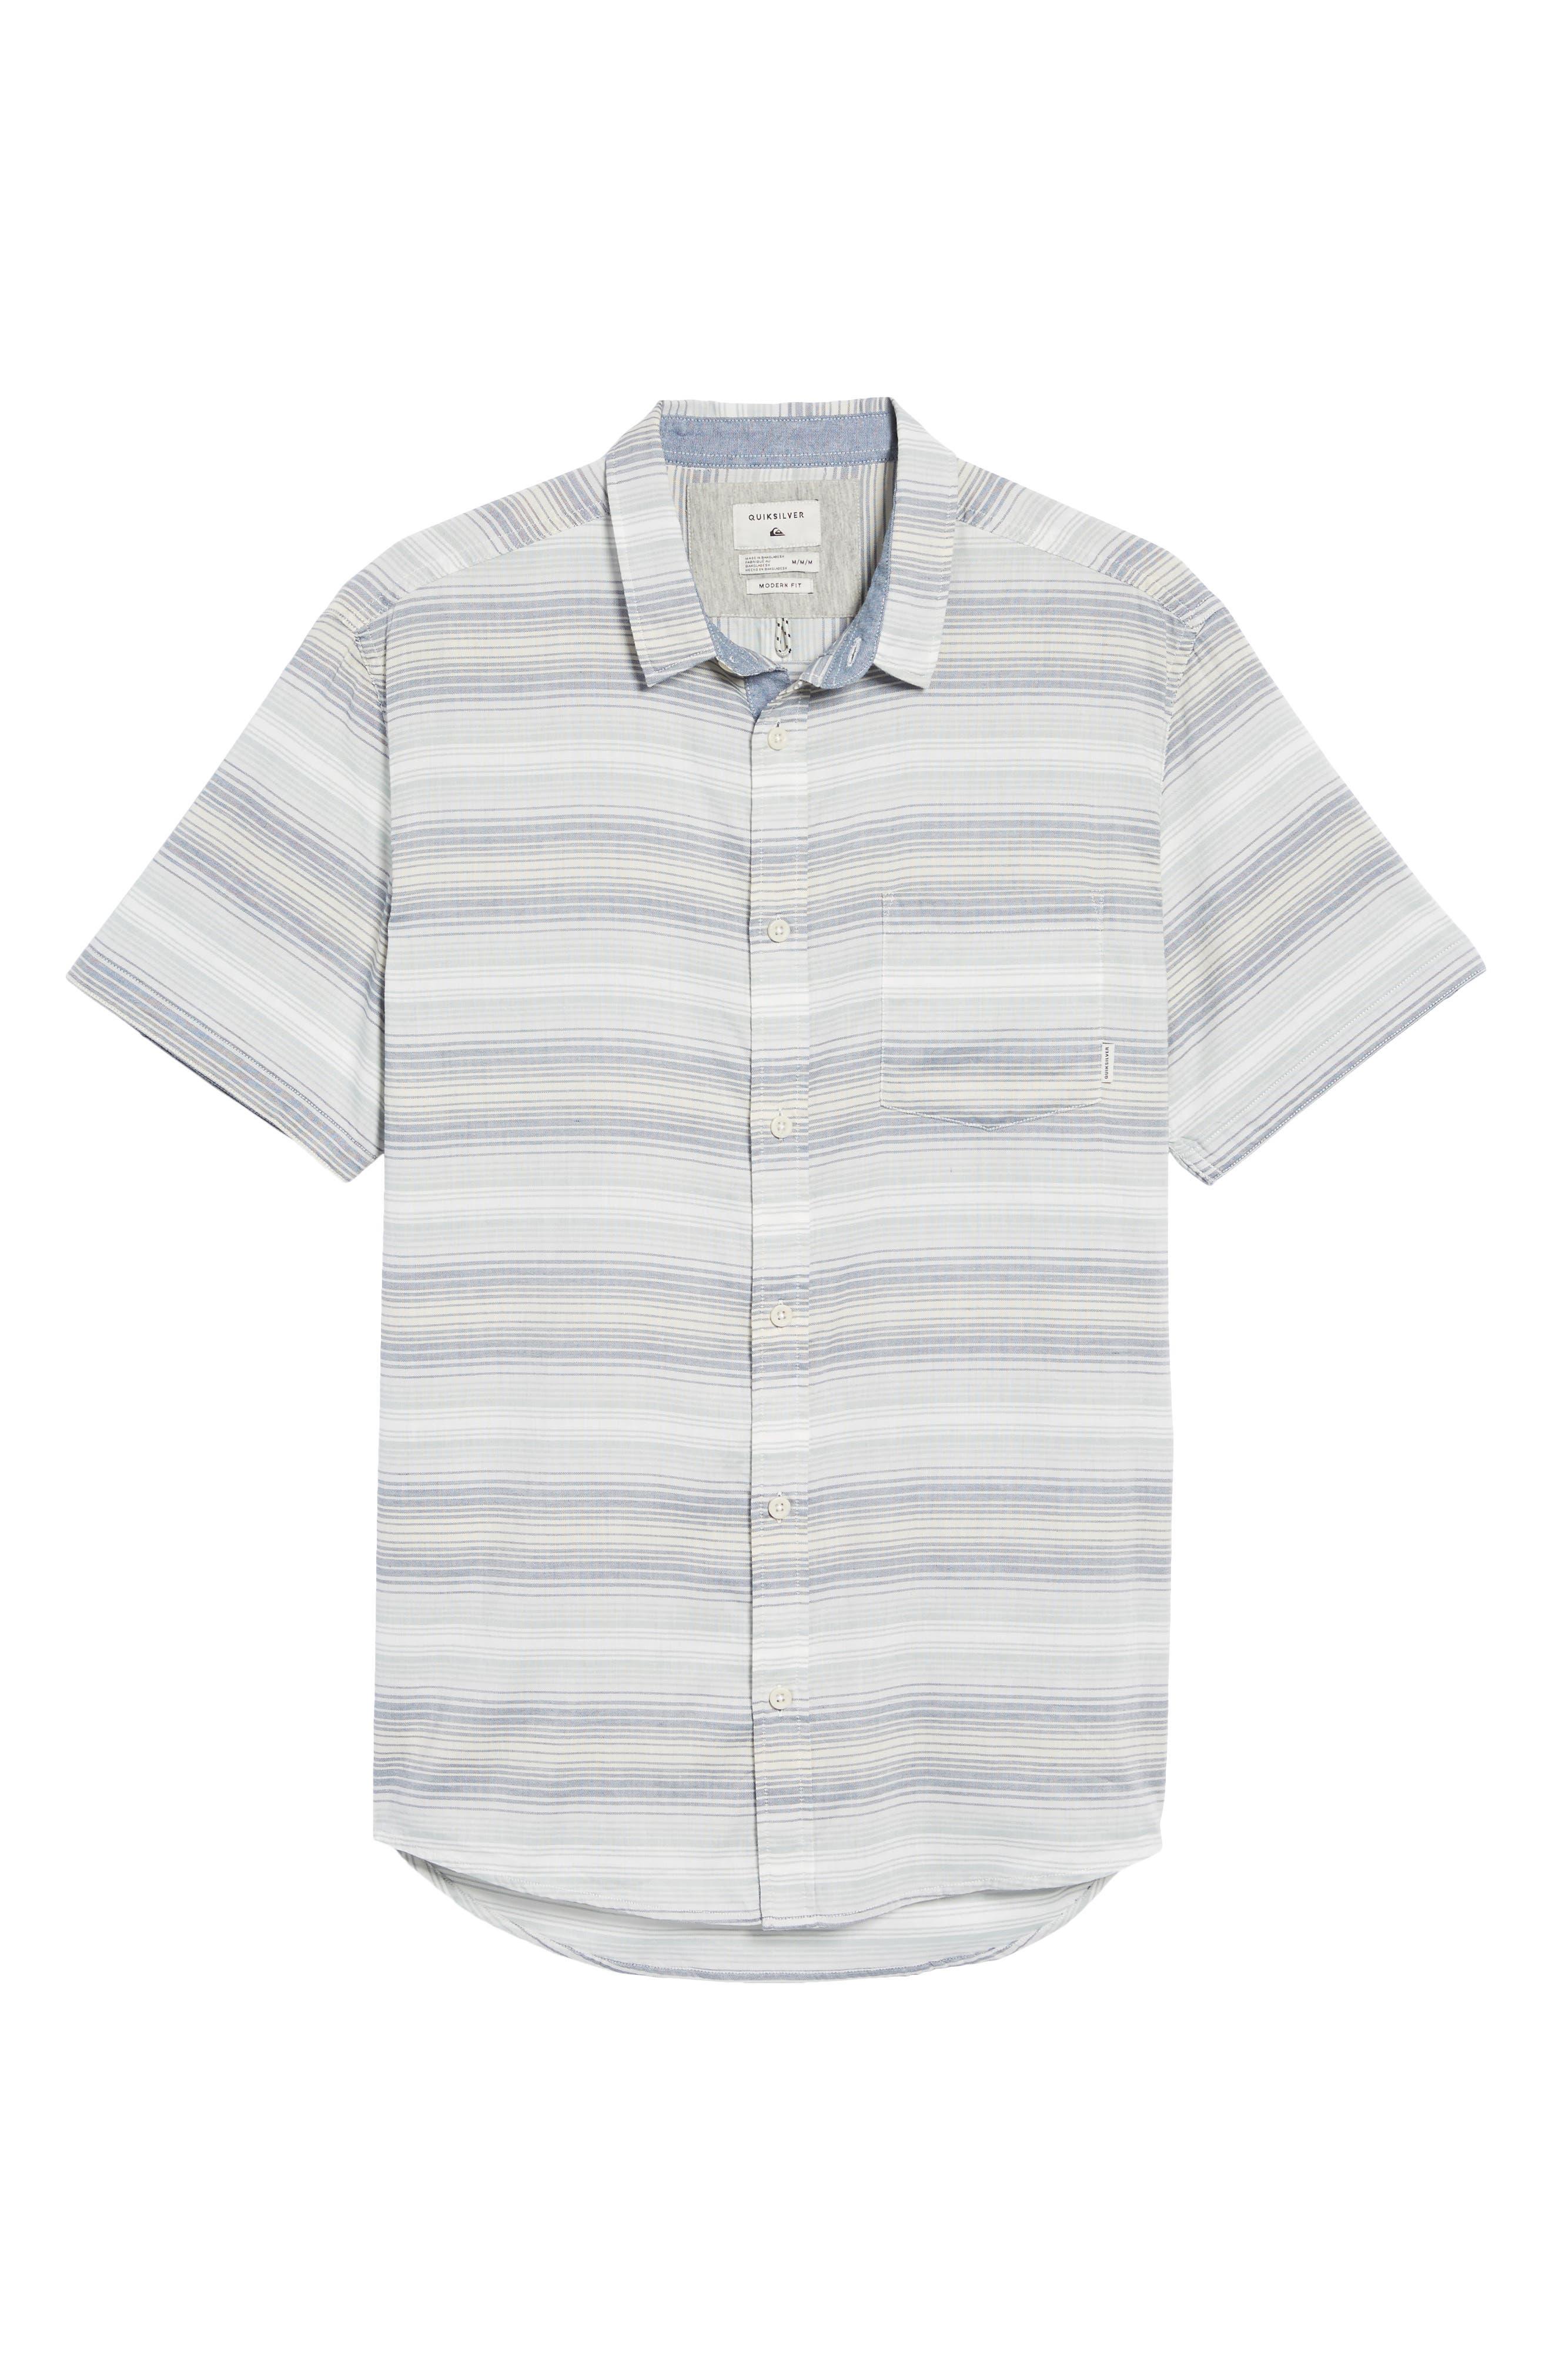 Aventail Stripe Shirt,                             Alternate thumbnail 11, color,